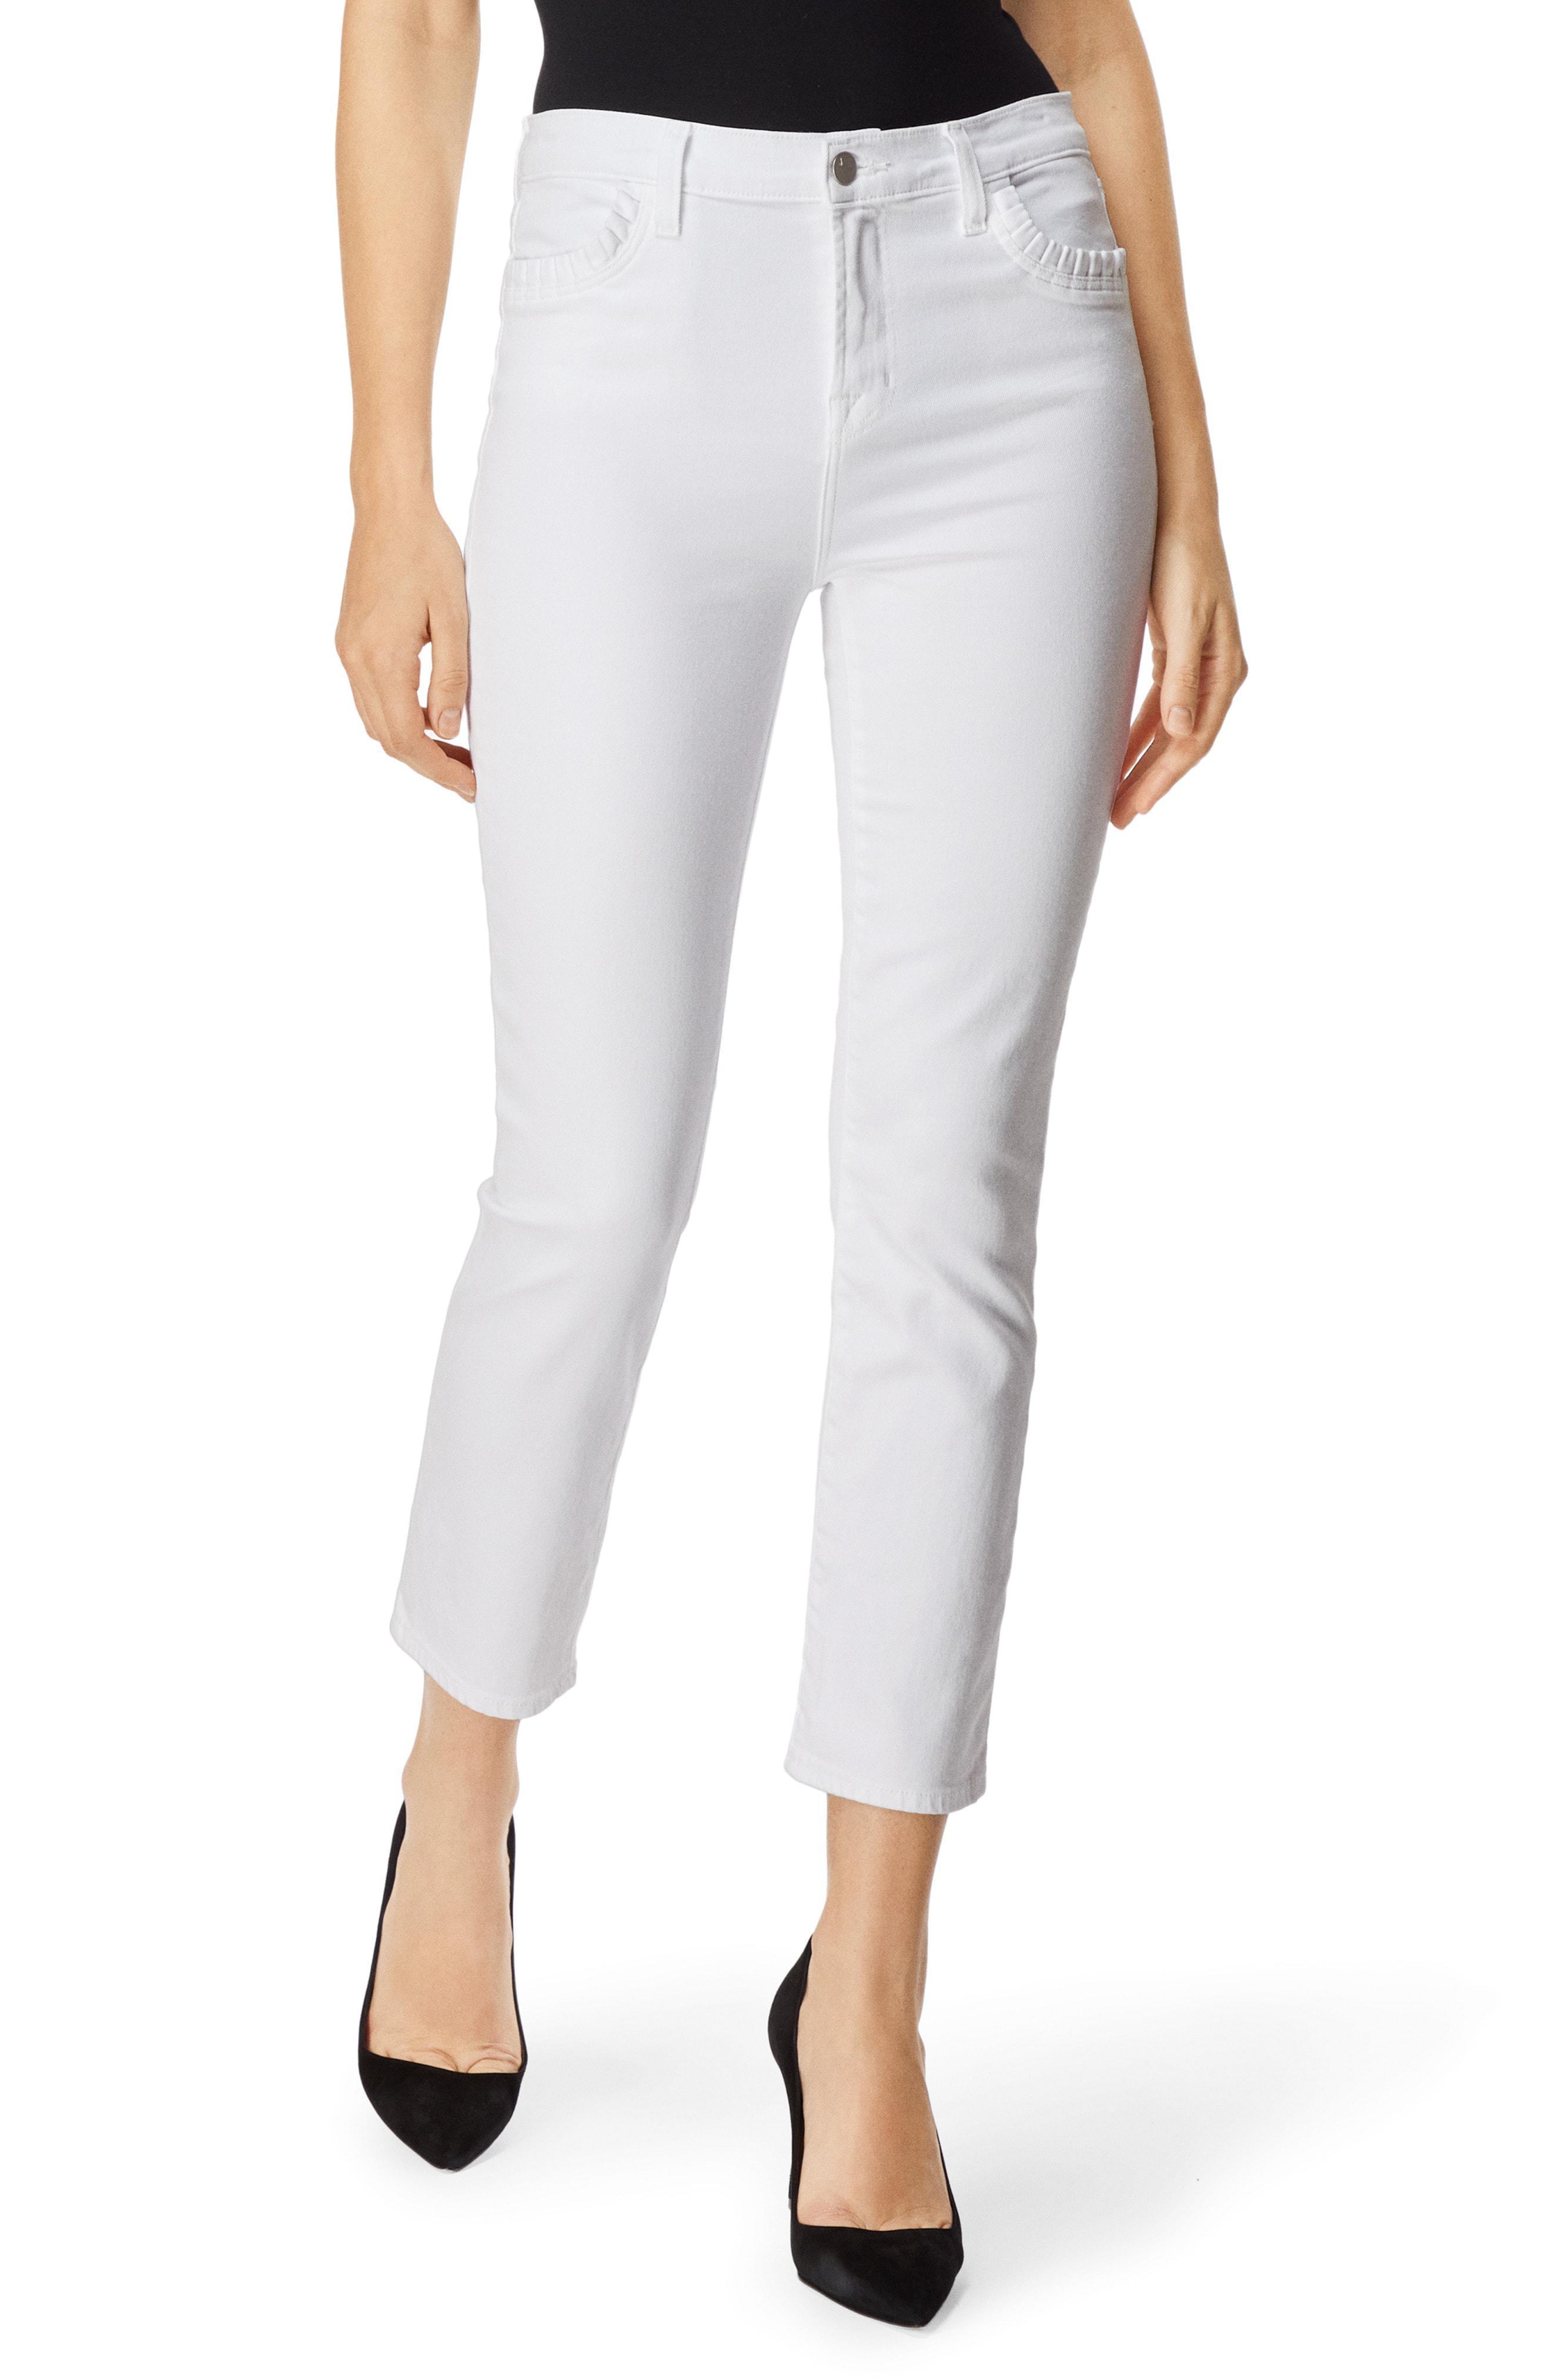 2dc73089ace9 J Brand. Women s Ruby High Waist Crop Cigarette Jeans